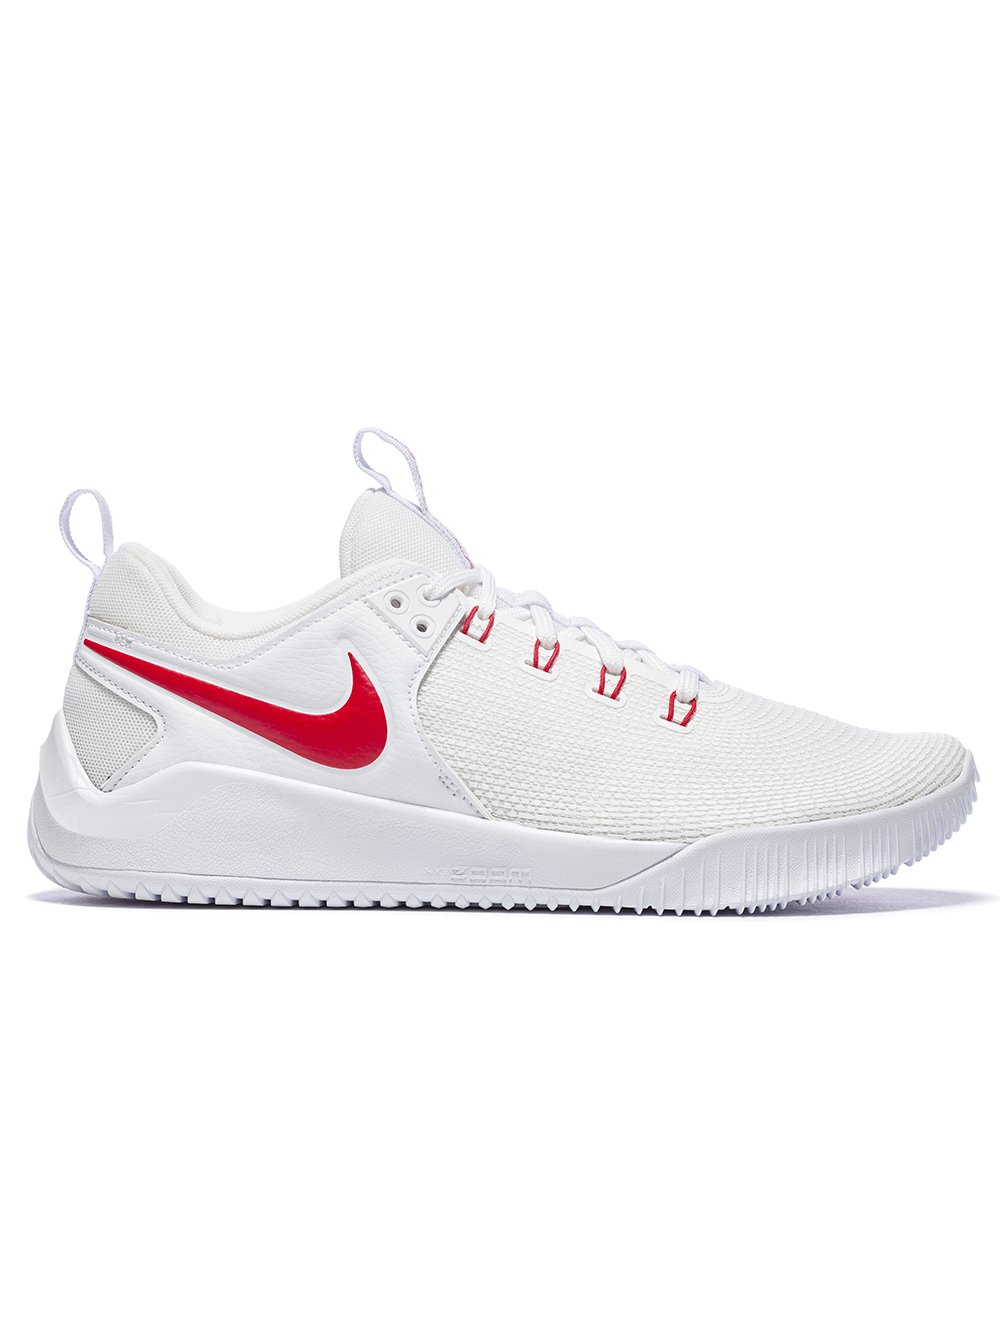 c2e0f6feea248d Galleon - Nike Women s Zoom HyperAce 2 Training Shoe White University Red  Size 7 M US